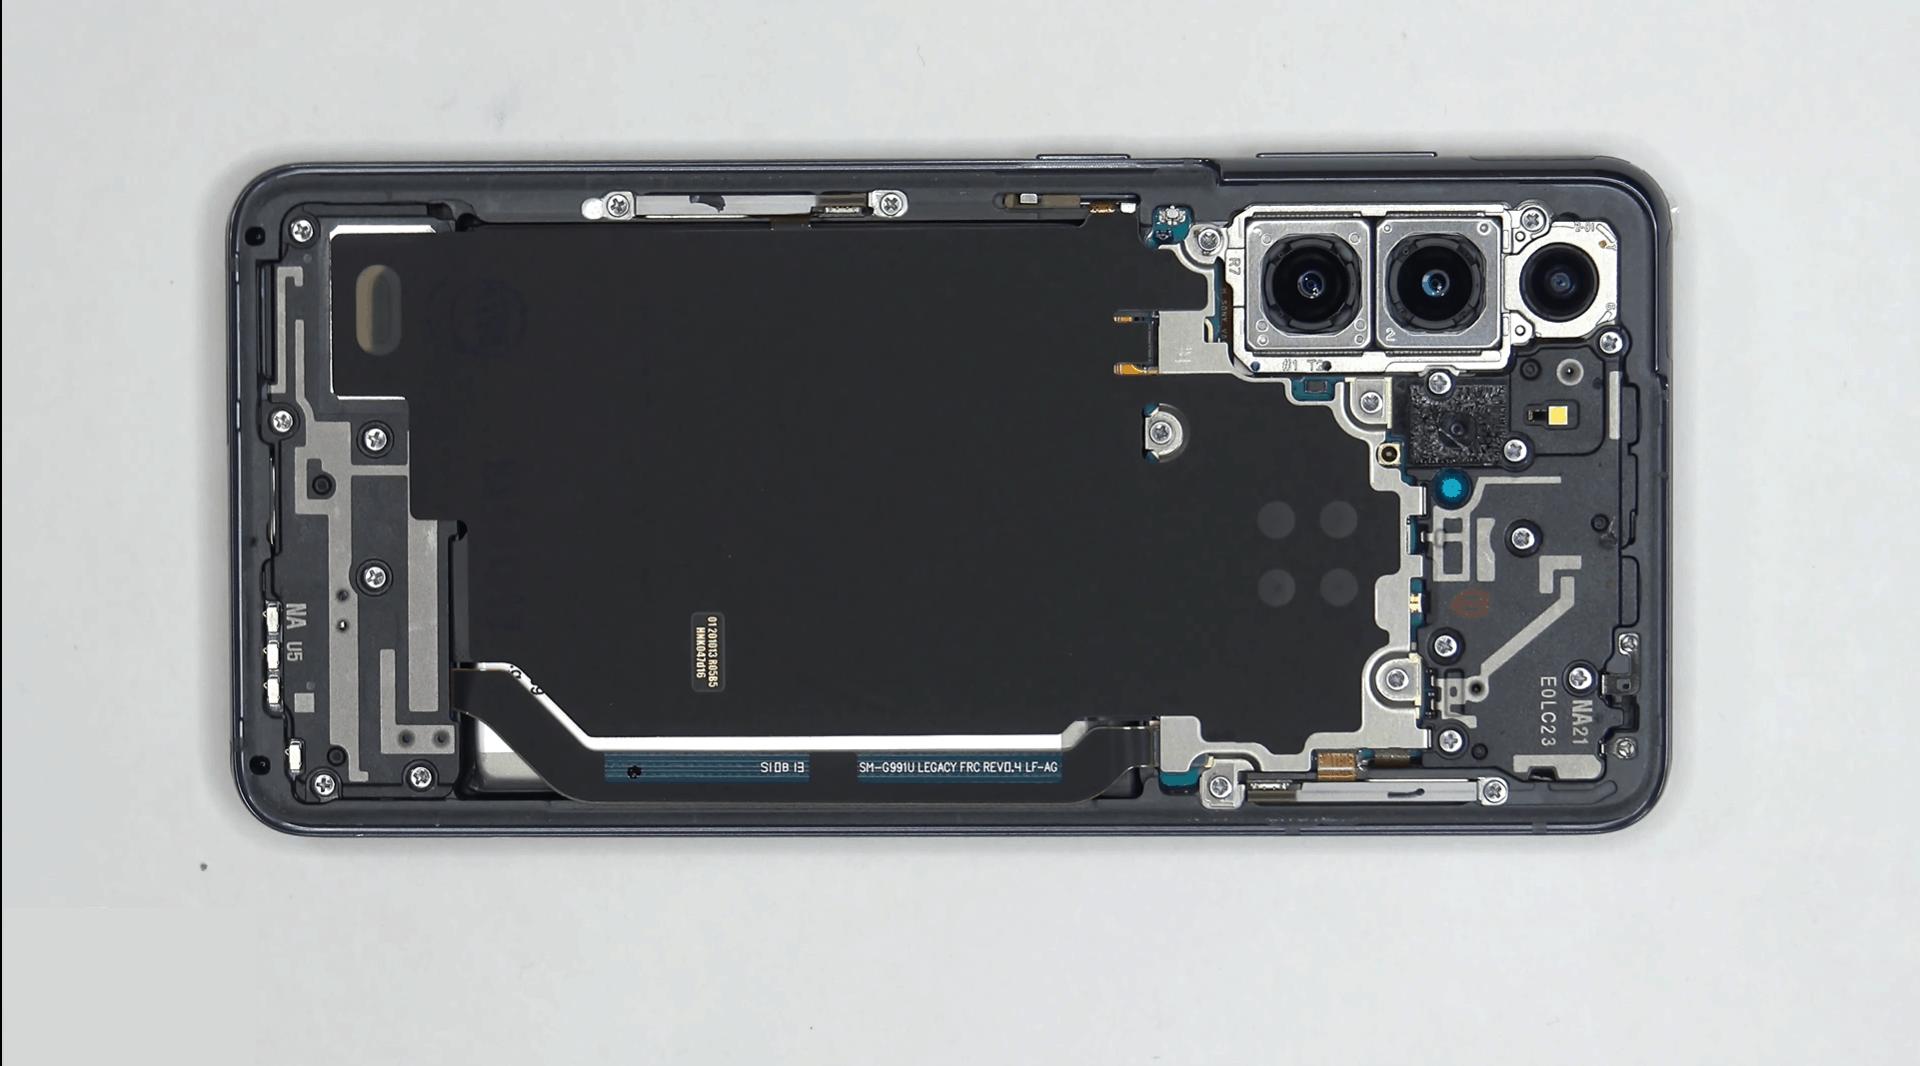 Peek Inside The Brand New Samsung Galaxy S21: Video